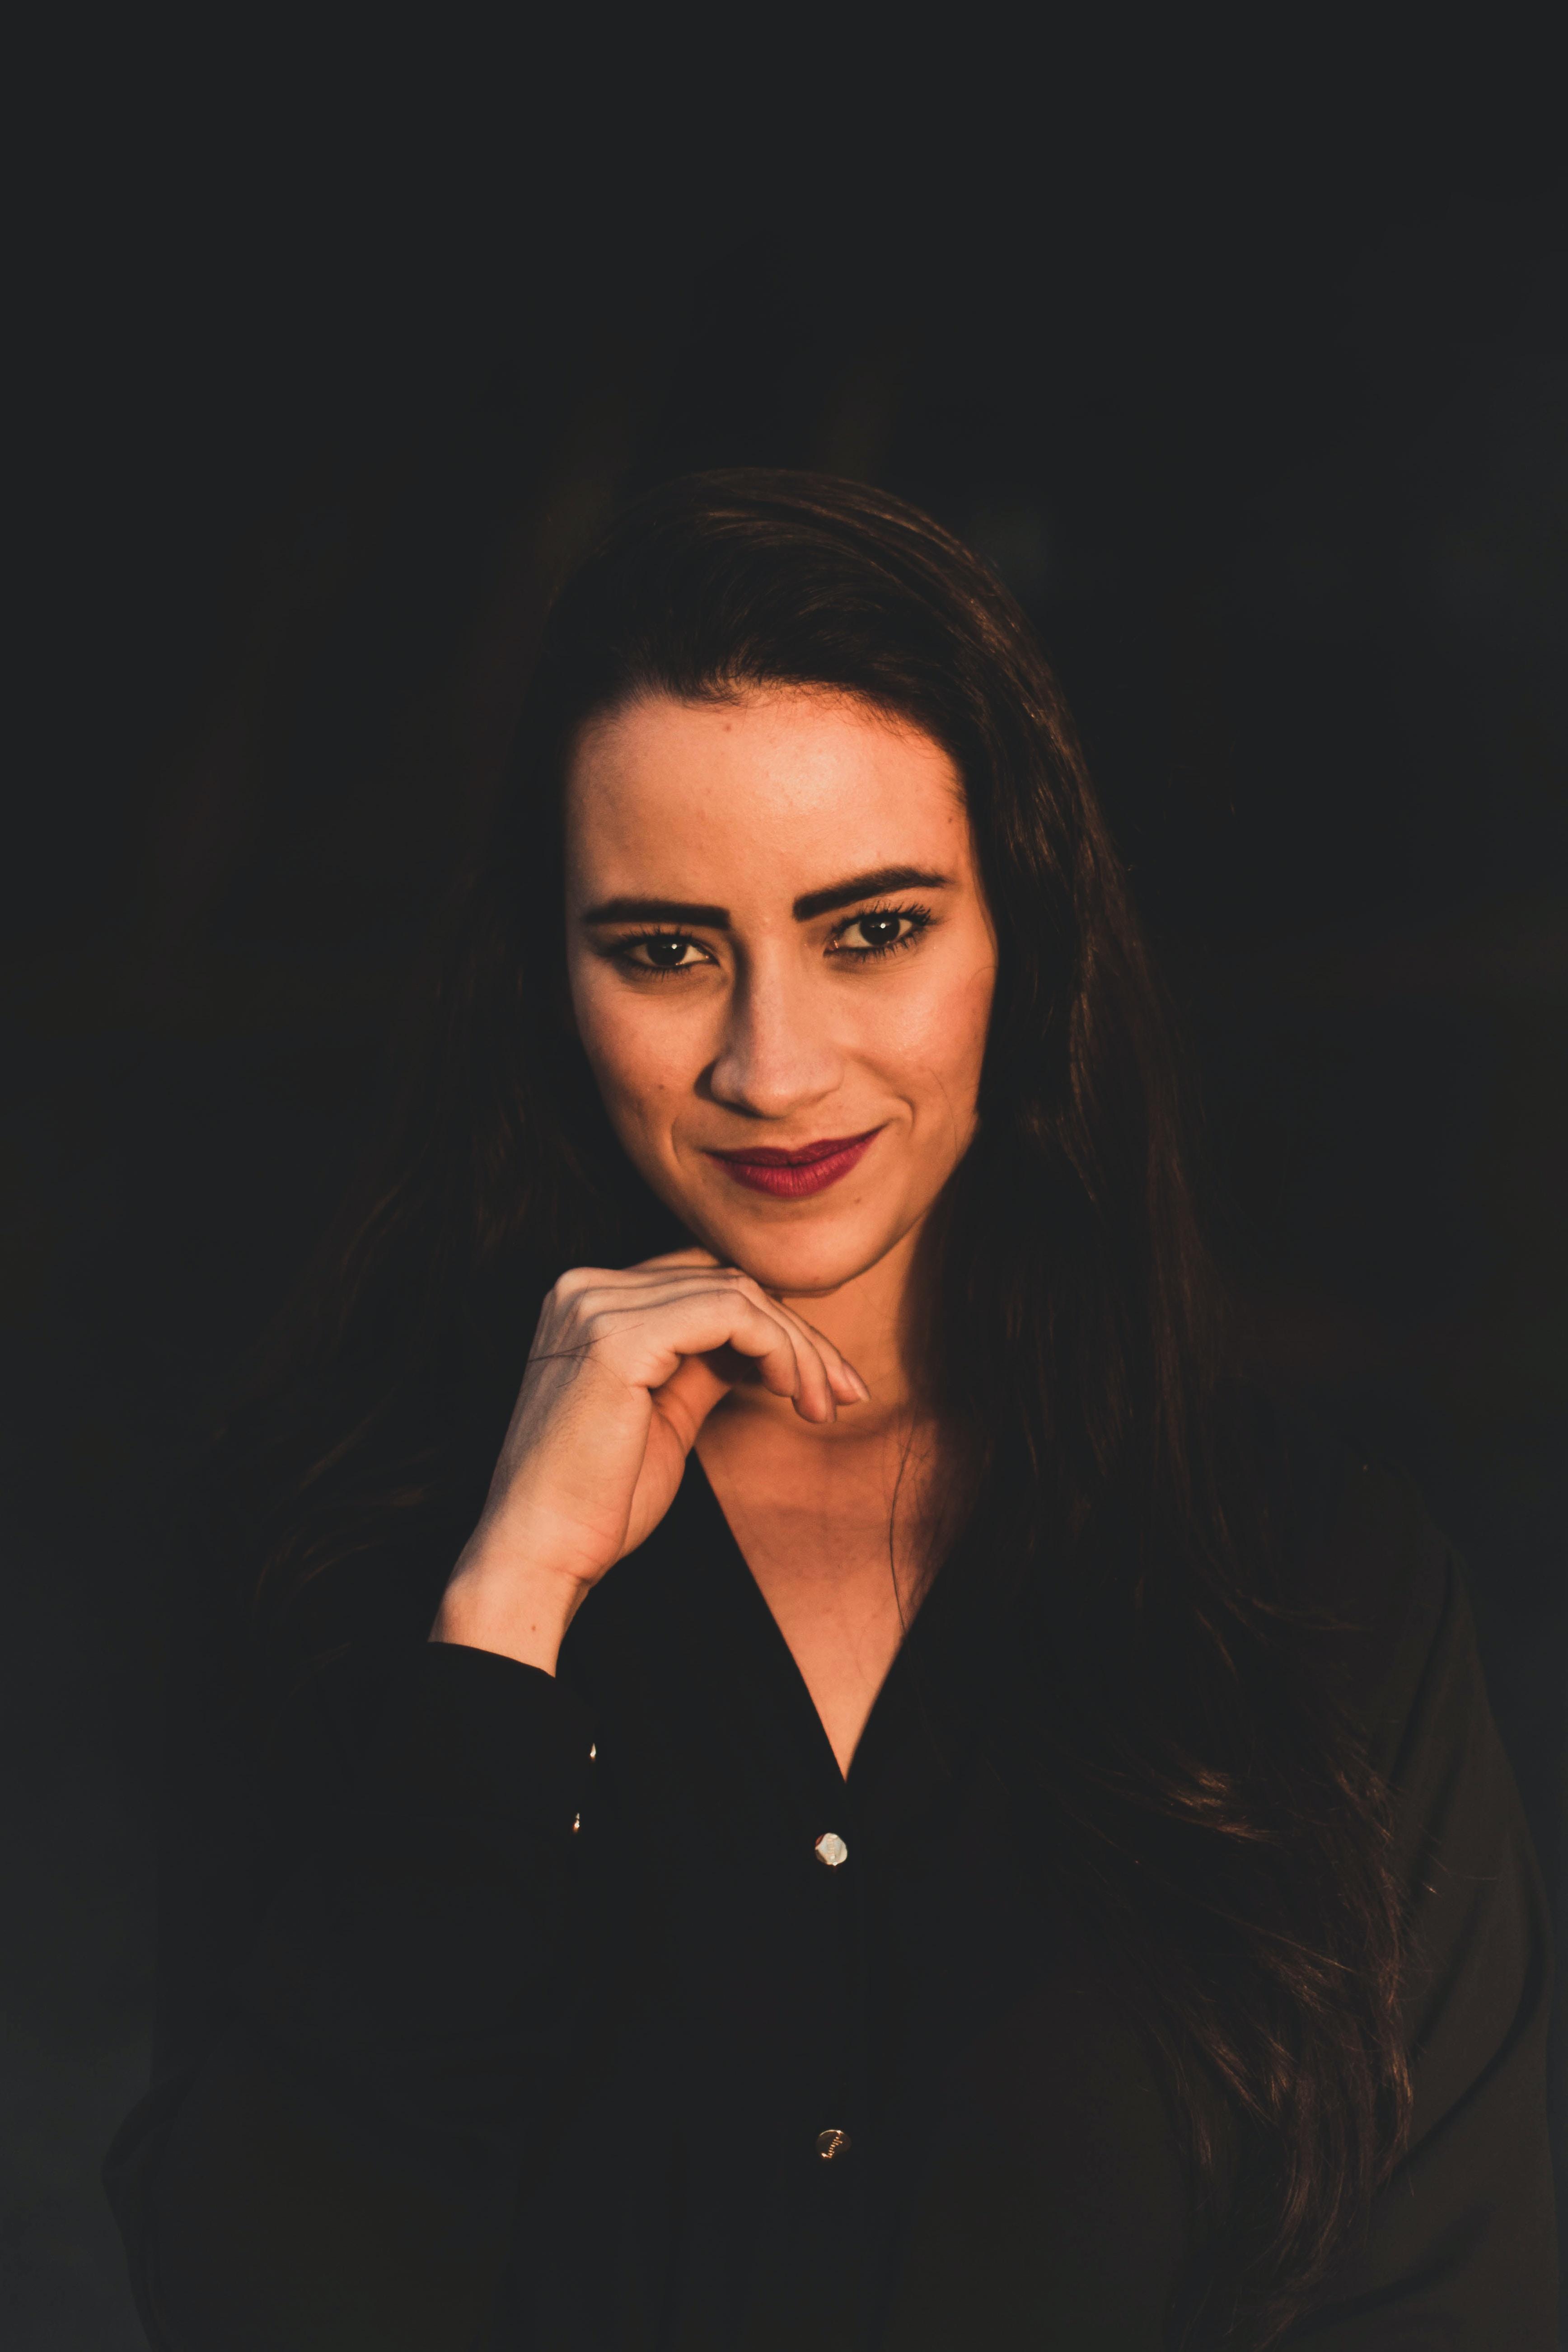 woman wearing black dress shirt making face